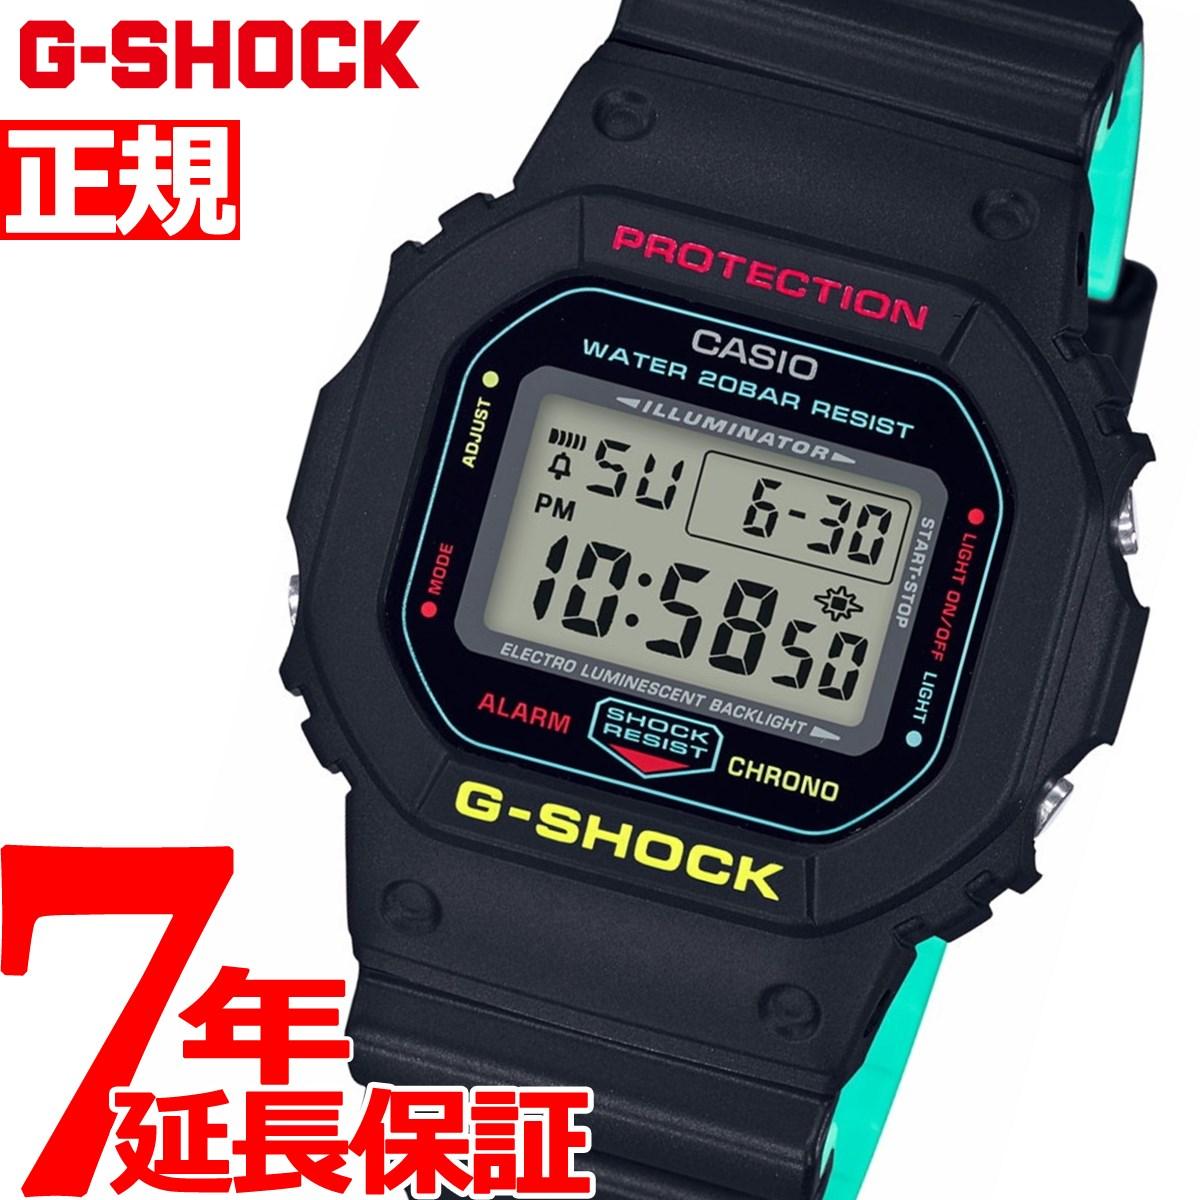 G-SHOCK デジタル 5600 カシオ Gショック CASIO 限定モデル 腕時計 メンズ ブリージー ラスタカラー Breezy Rasta Color DW-5600CMB-1JF【2018 新作】